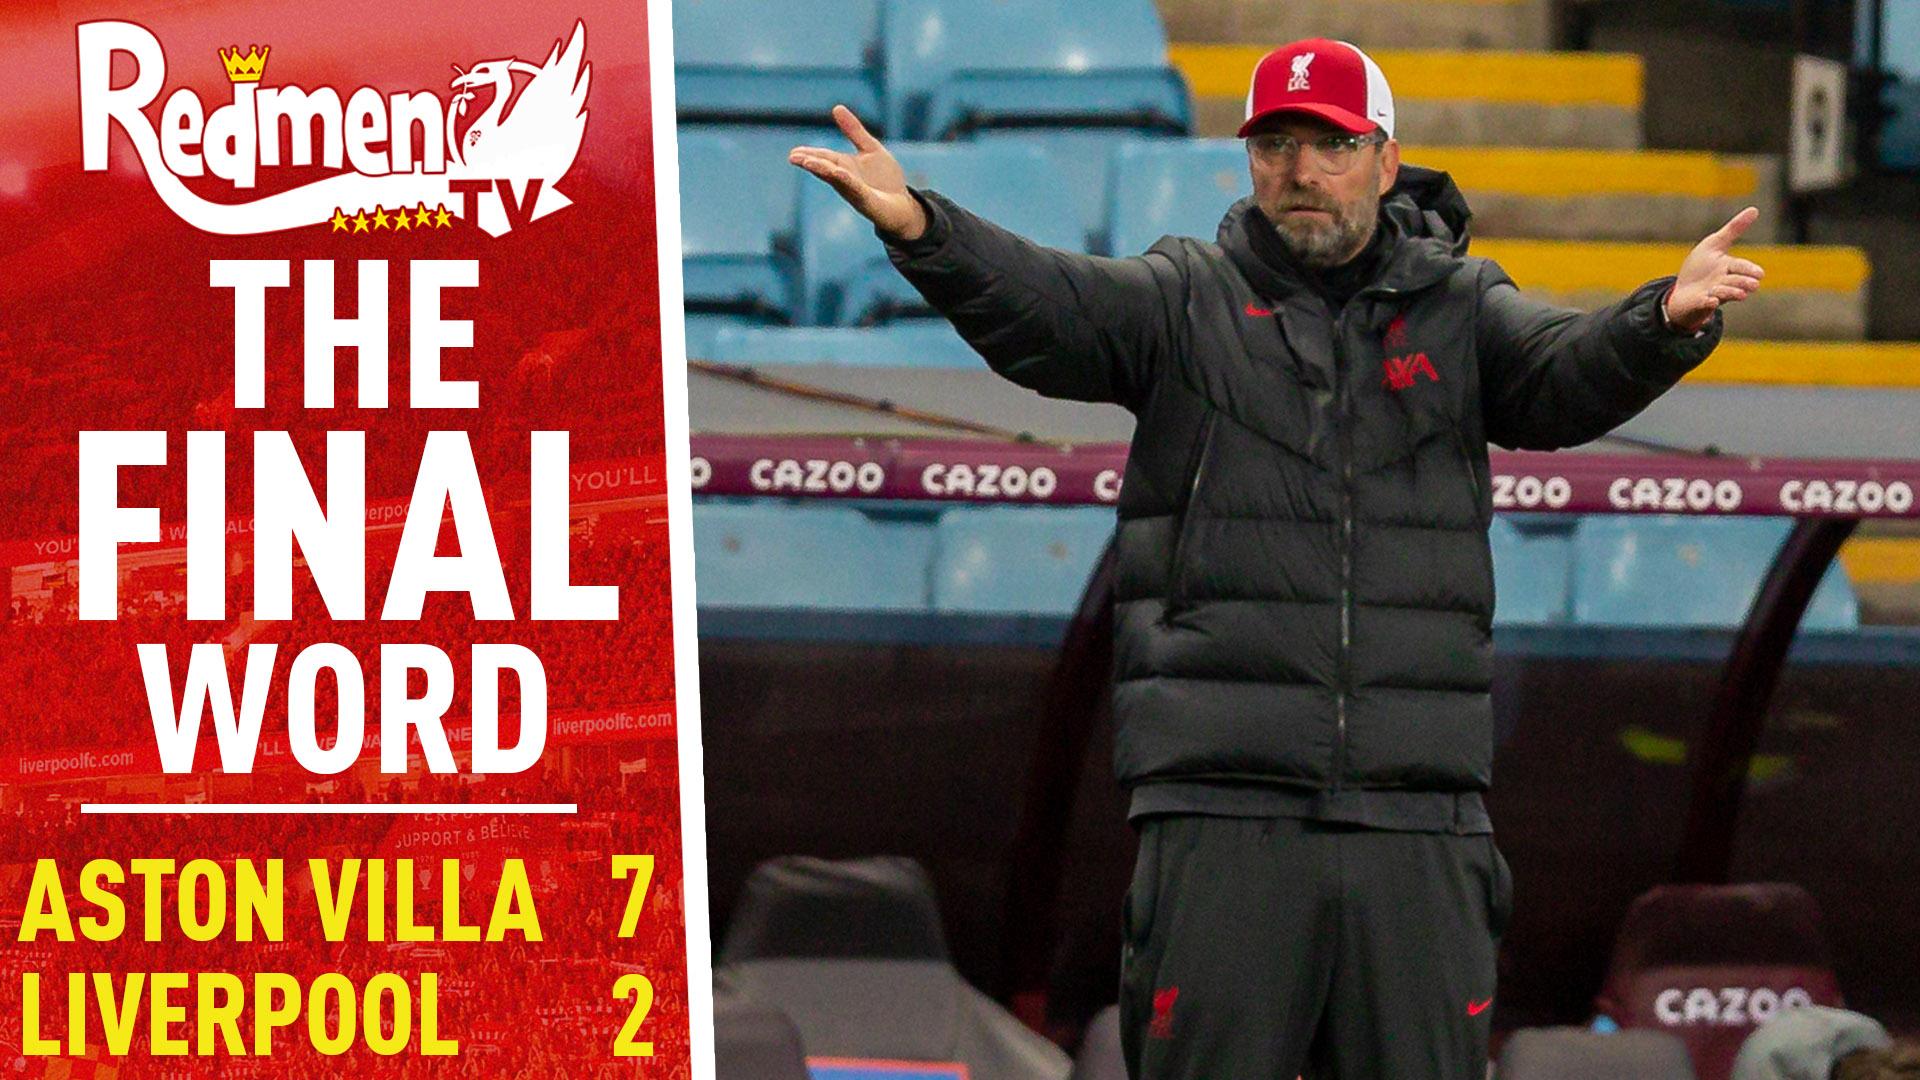 Aston Villa 7 2 Liverpool The Final Word The Redmen Tv